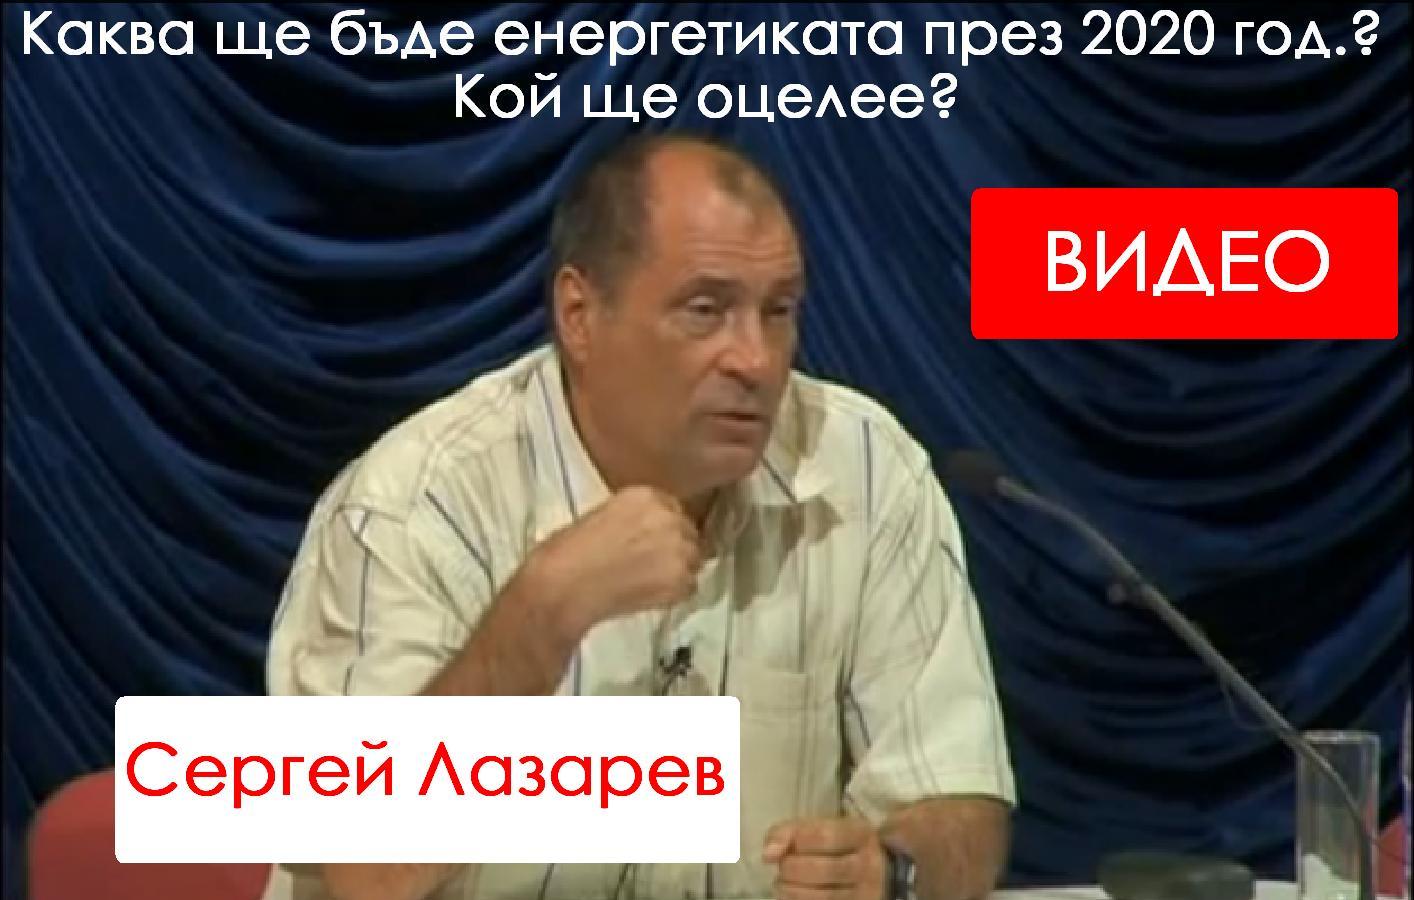 Сергей Лазарев видео енергетика 2020 година Sergei Lazarev video